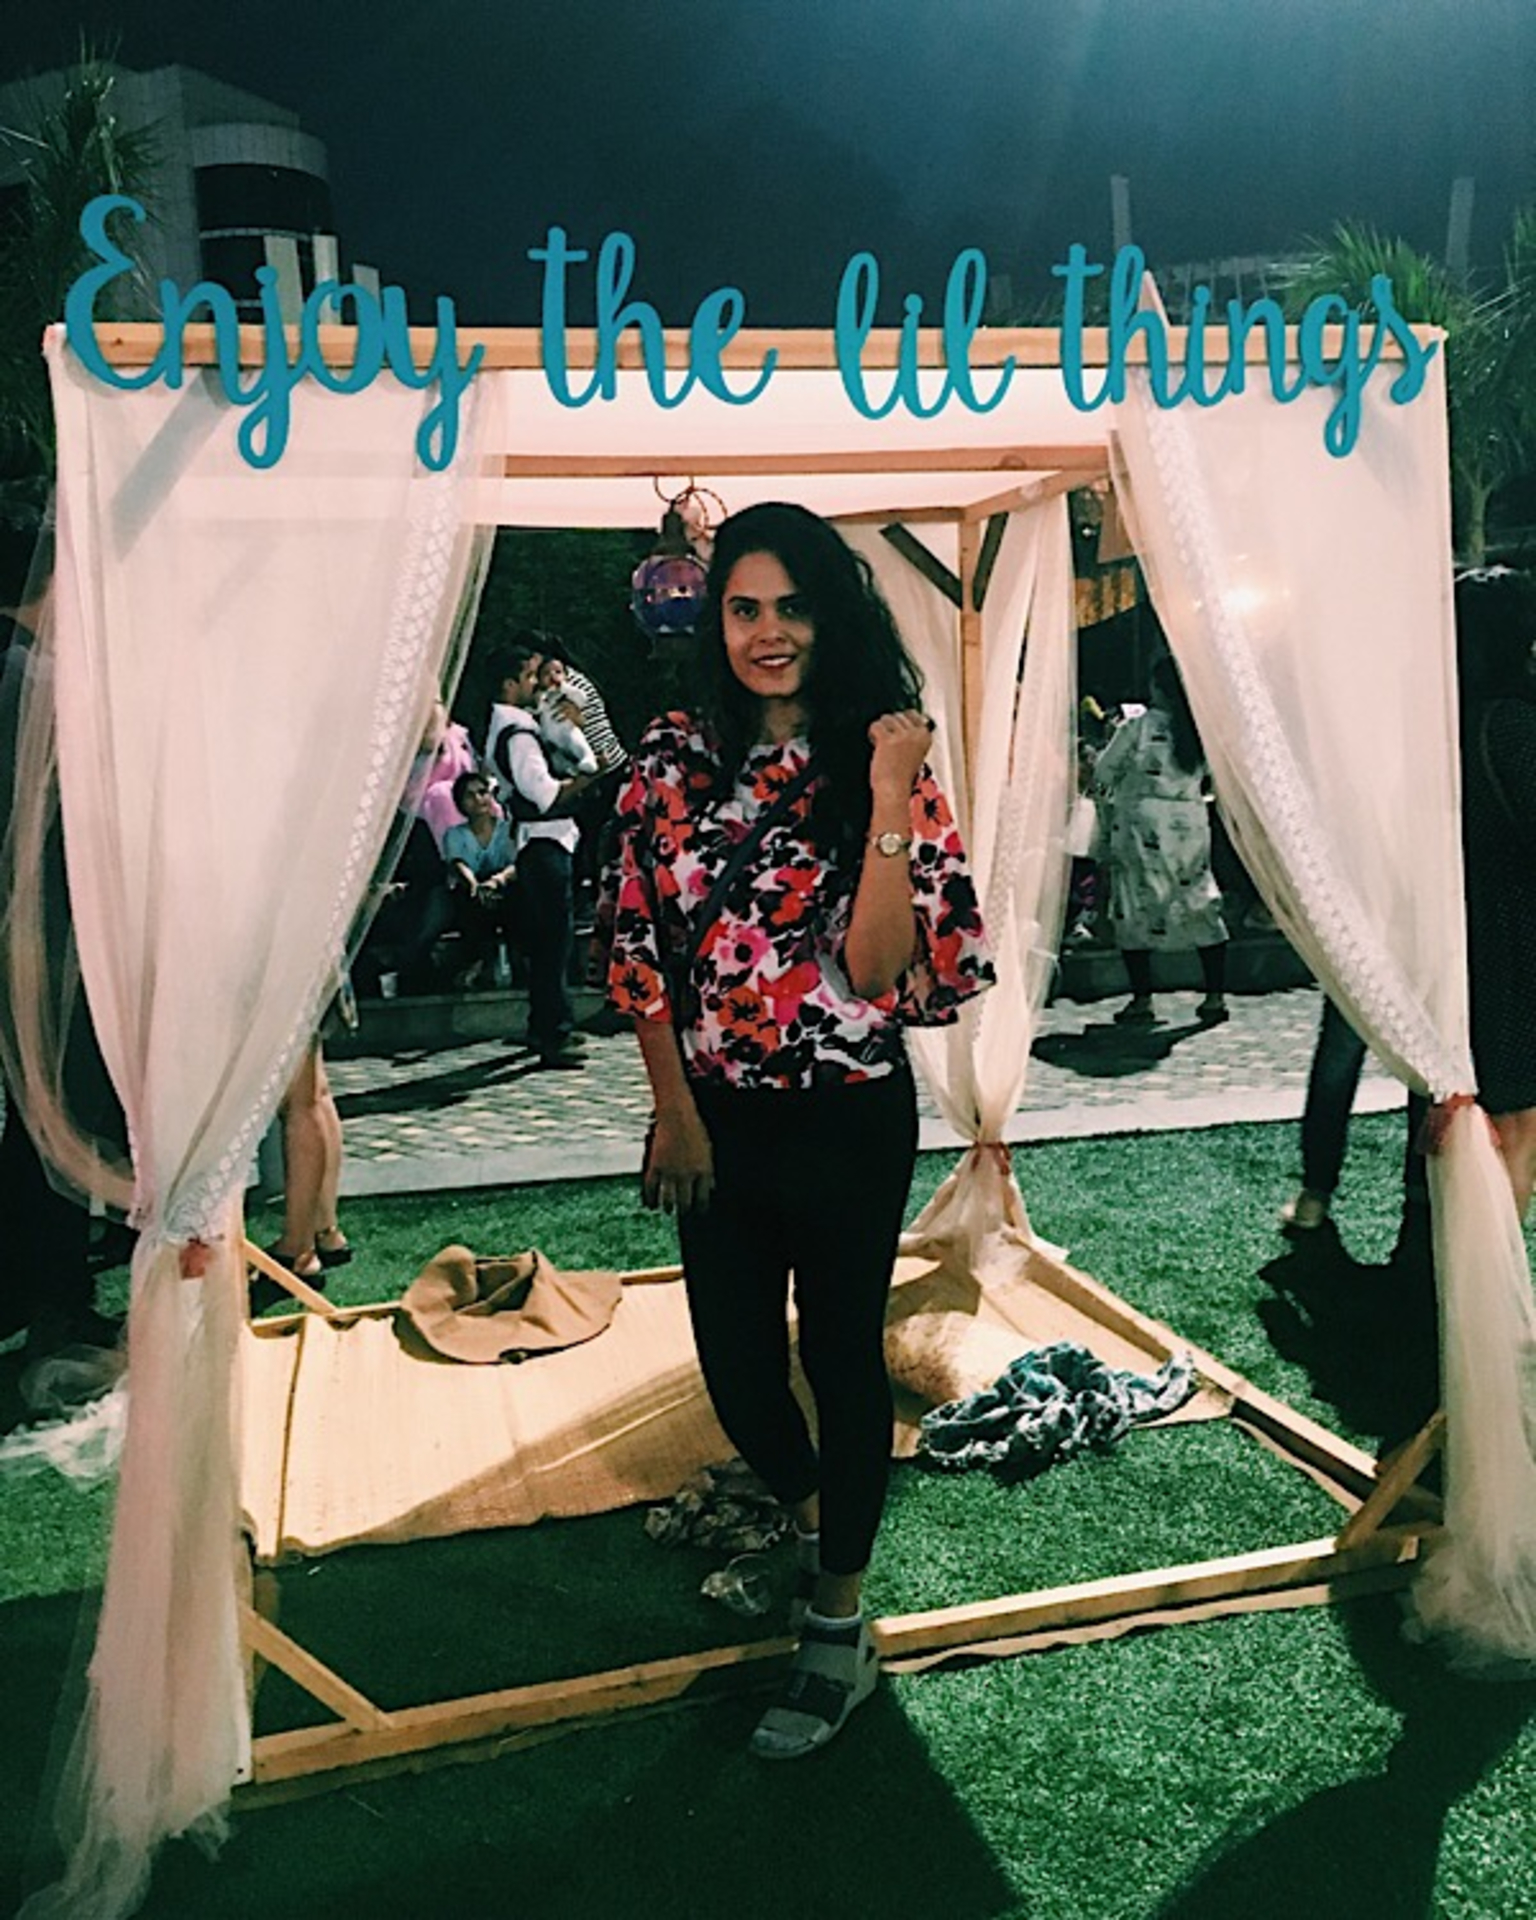 THE GLAM NUT - Fashion & Lifestyle Blog - The lil flea 11